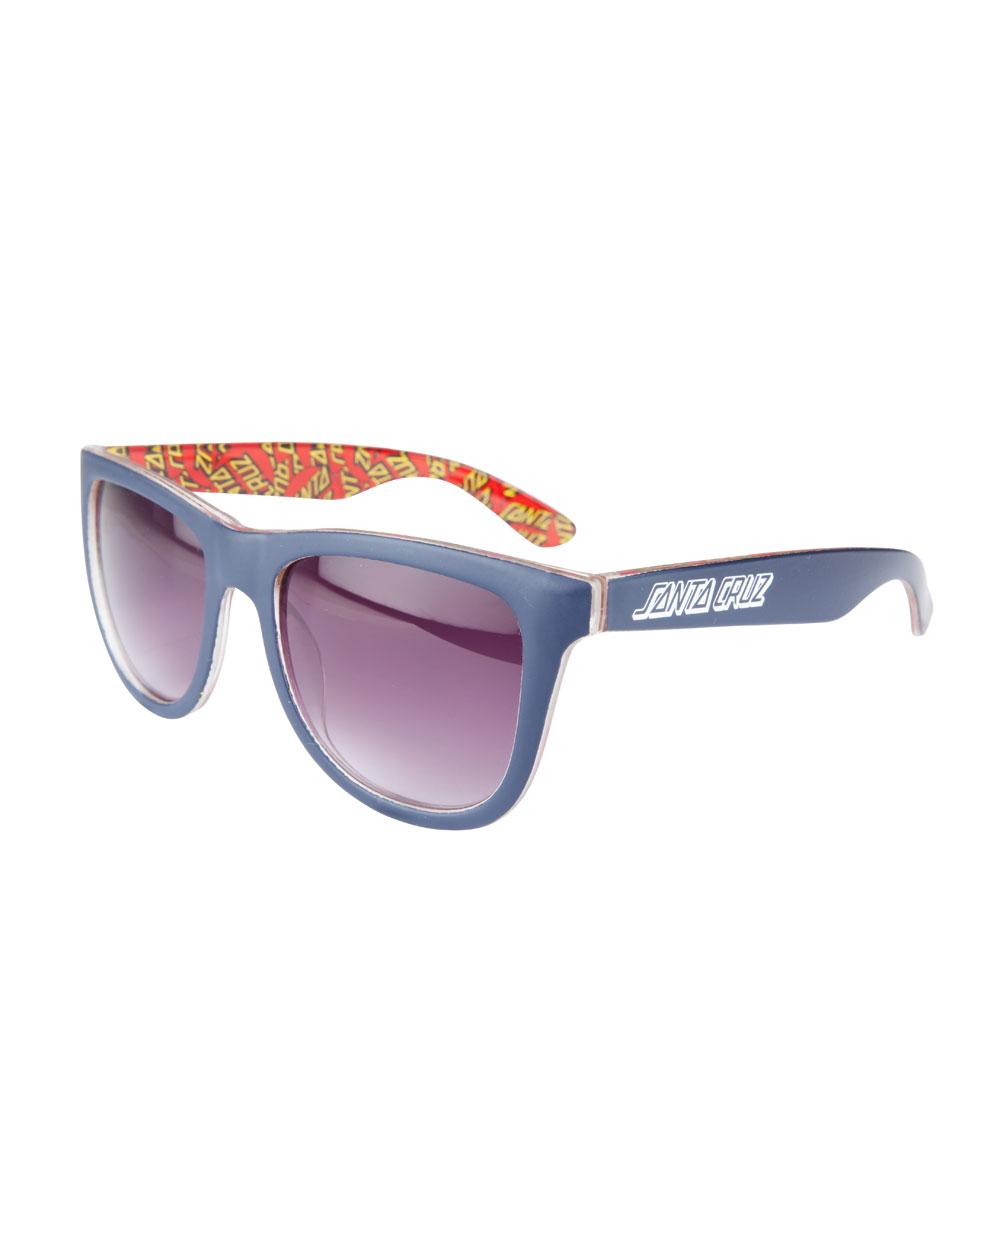 Santa Cruz Men's Sunglasses Multi Classic Dot Dark Navy